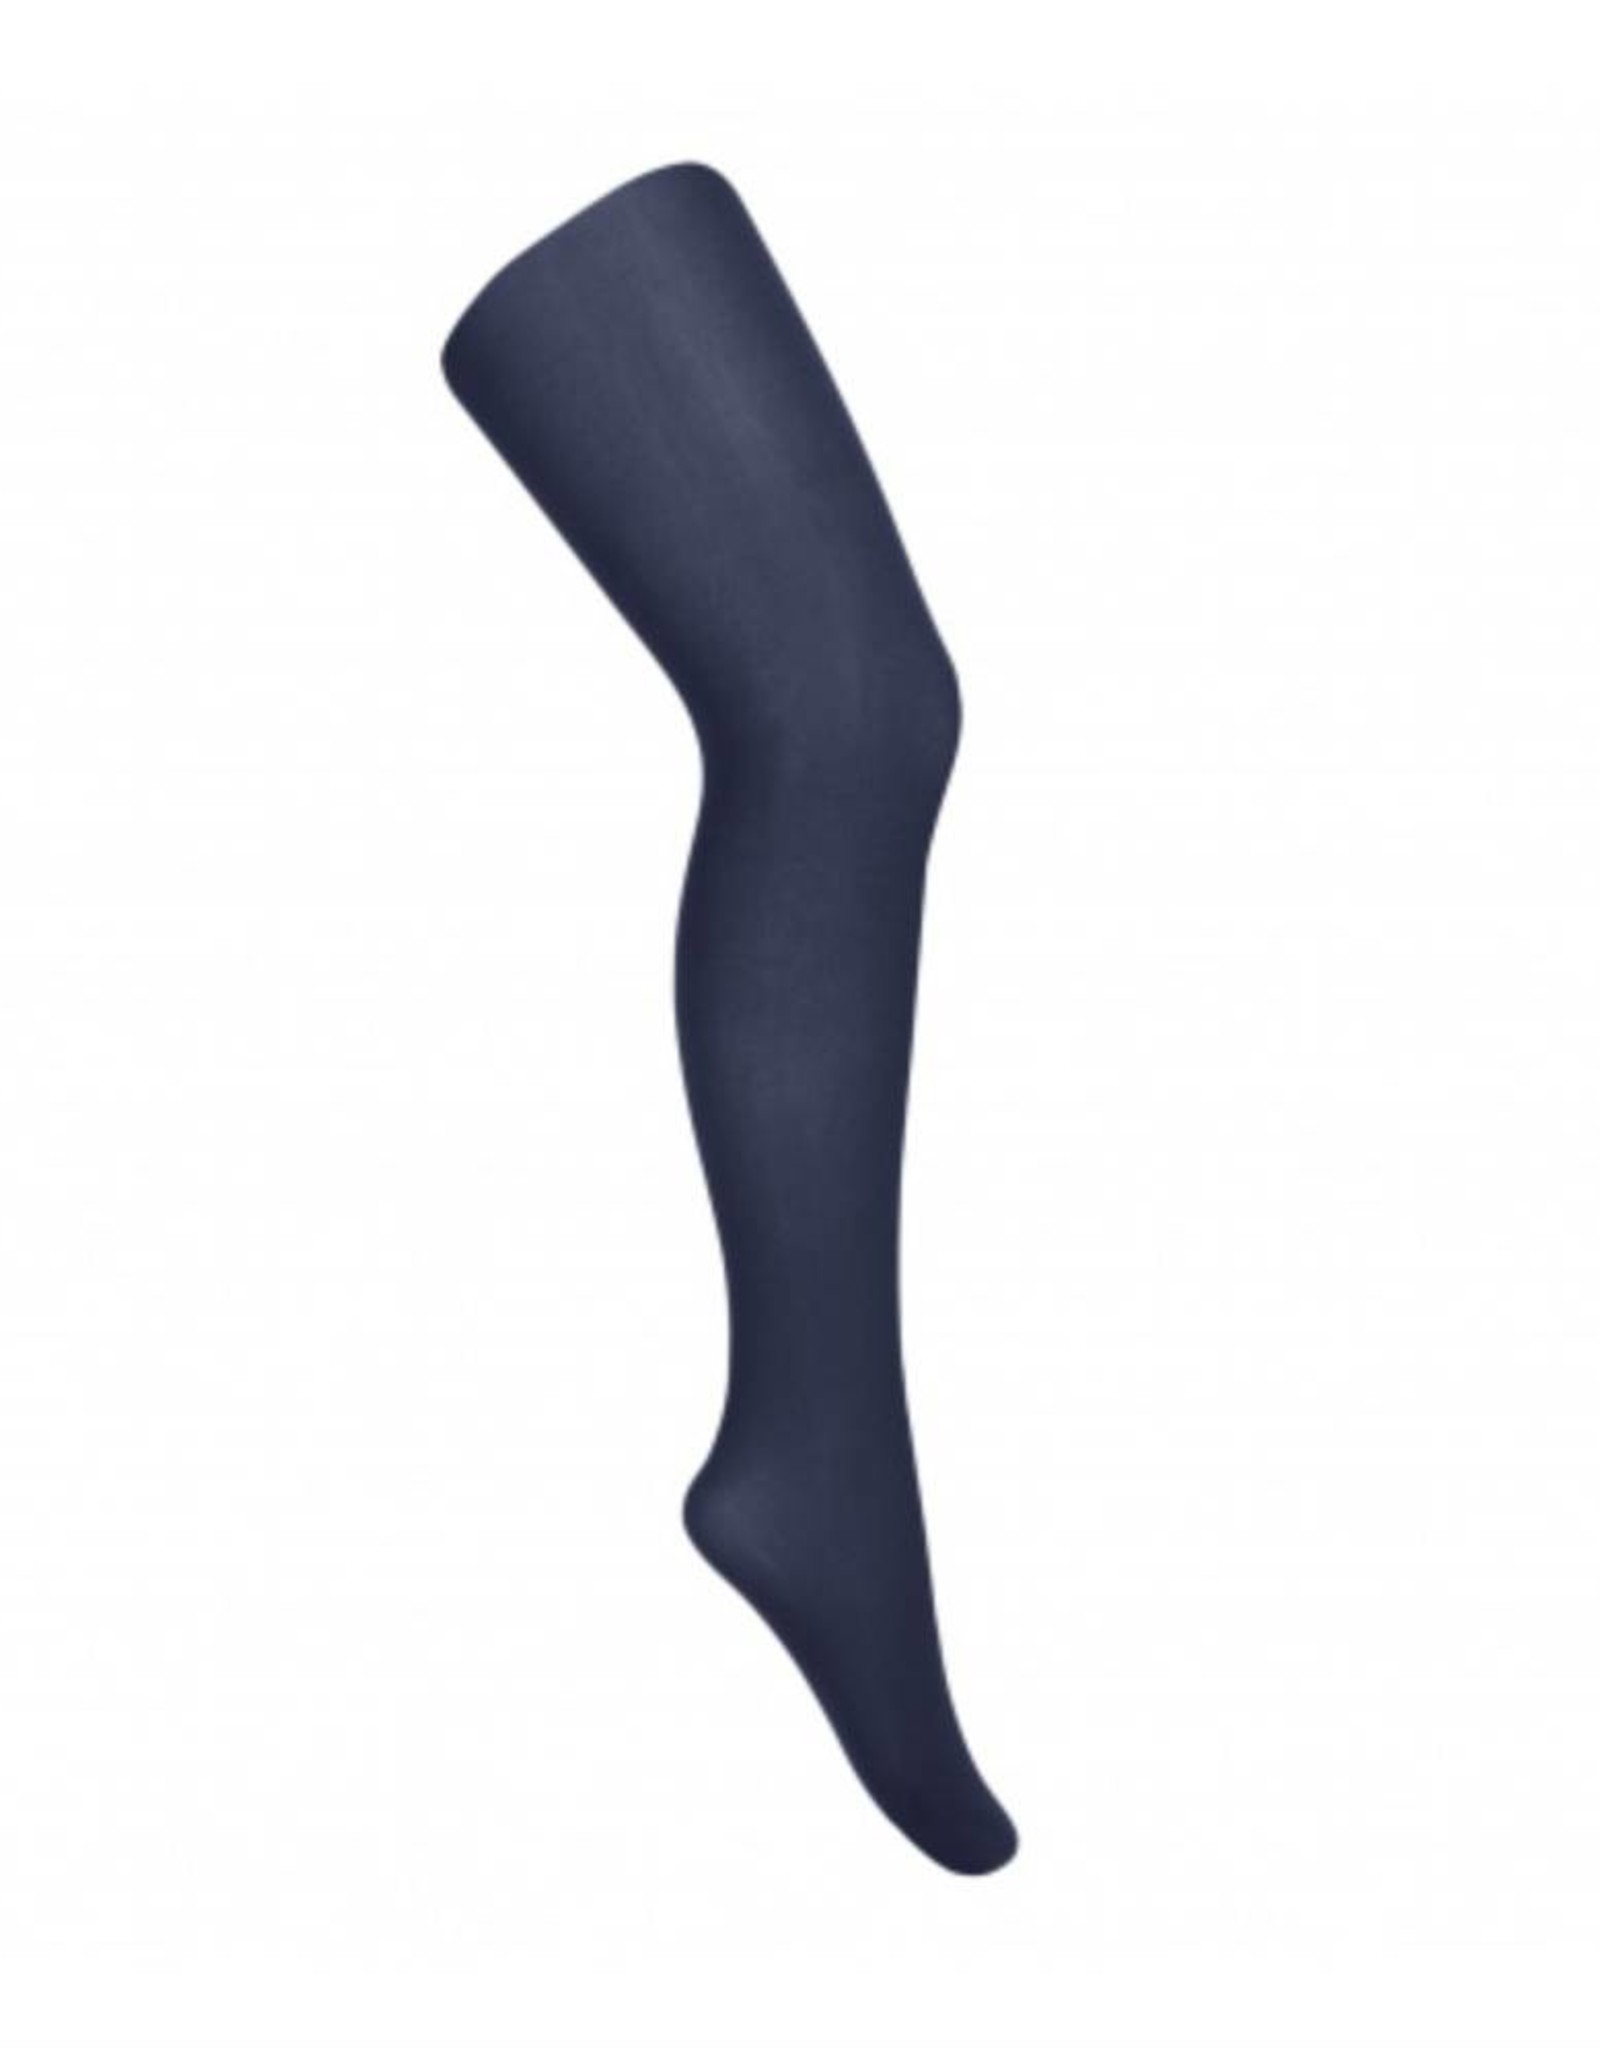 Microfiber tights